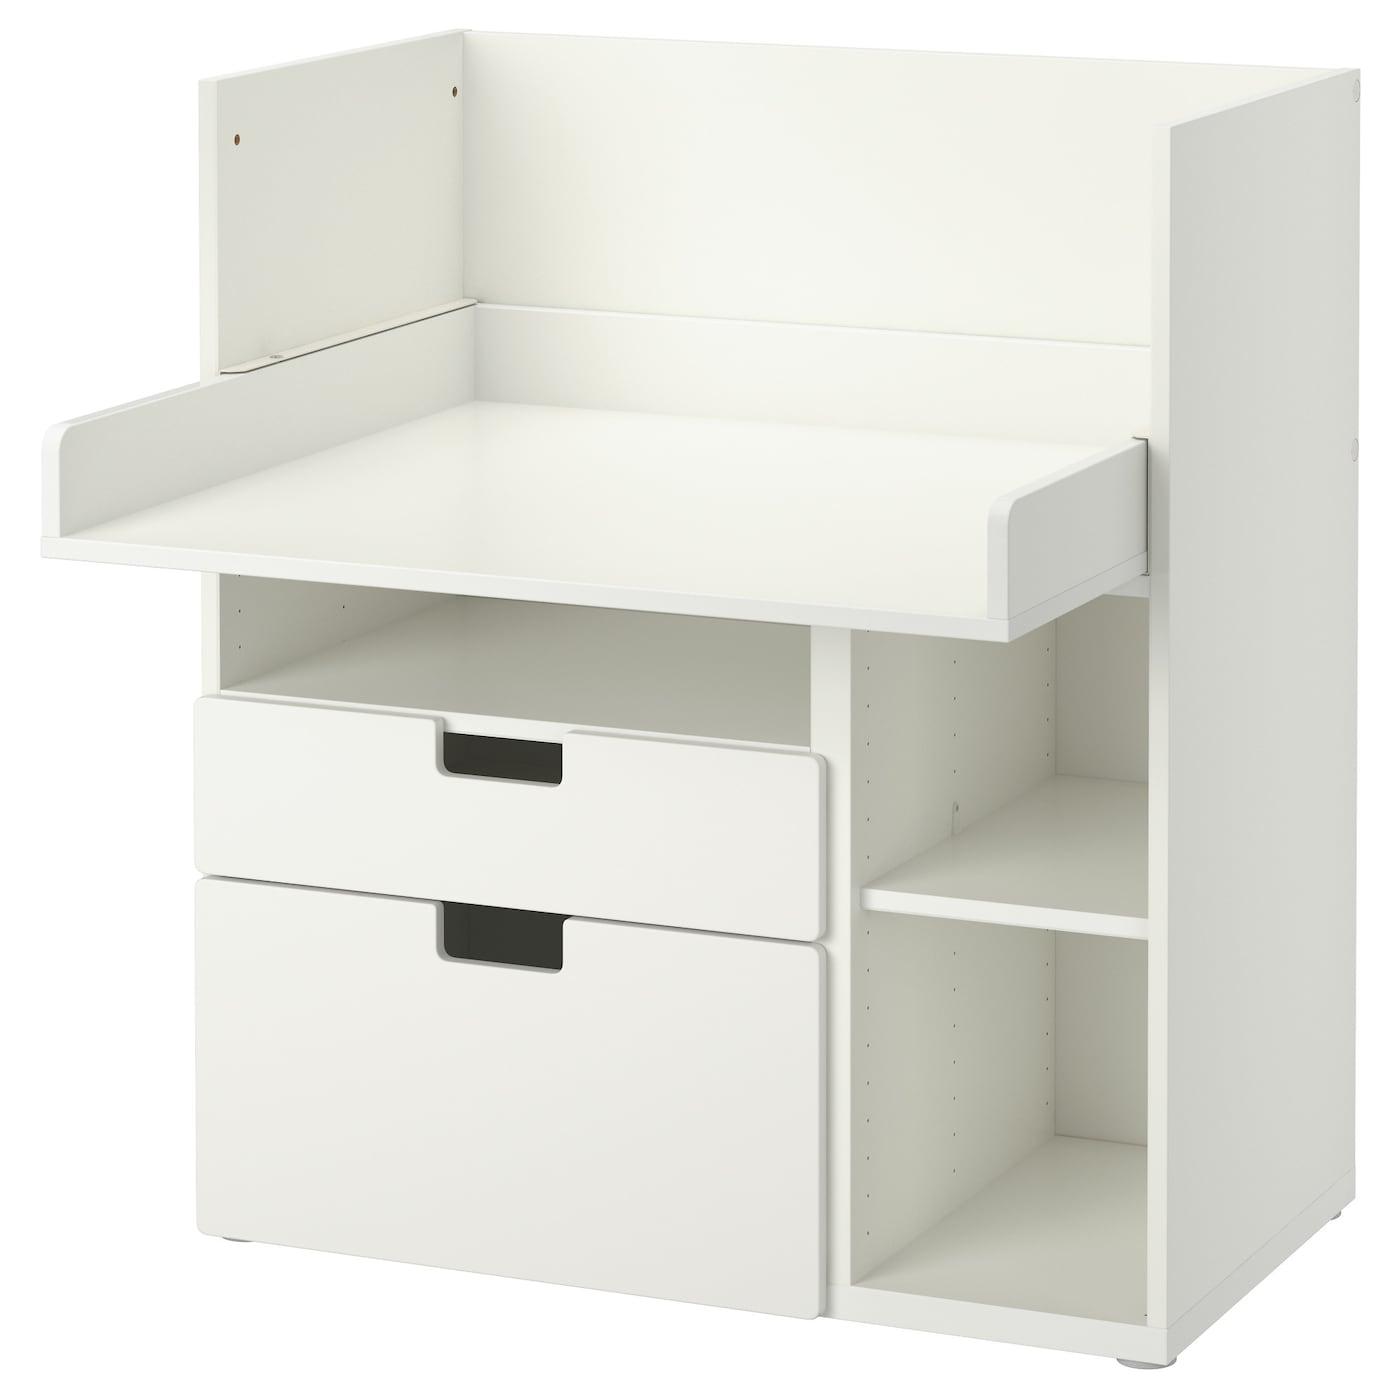 Children 39 s storage units children 39 s storage solutions ikea - Table angle ikea ...